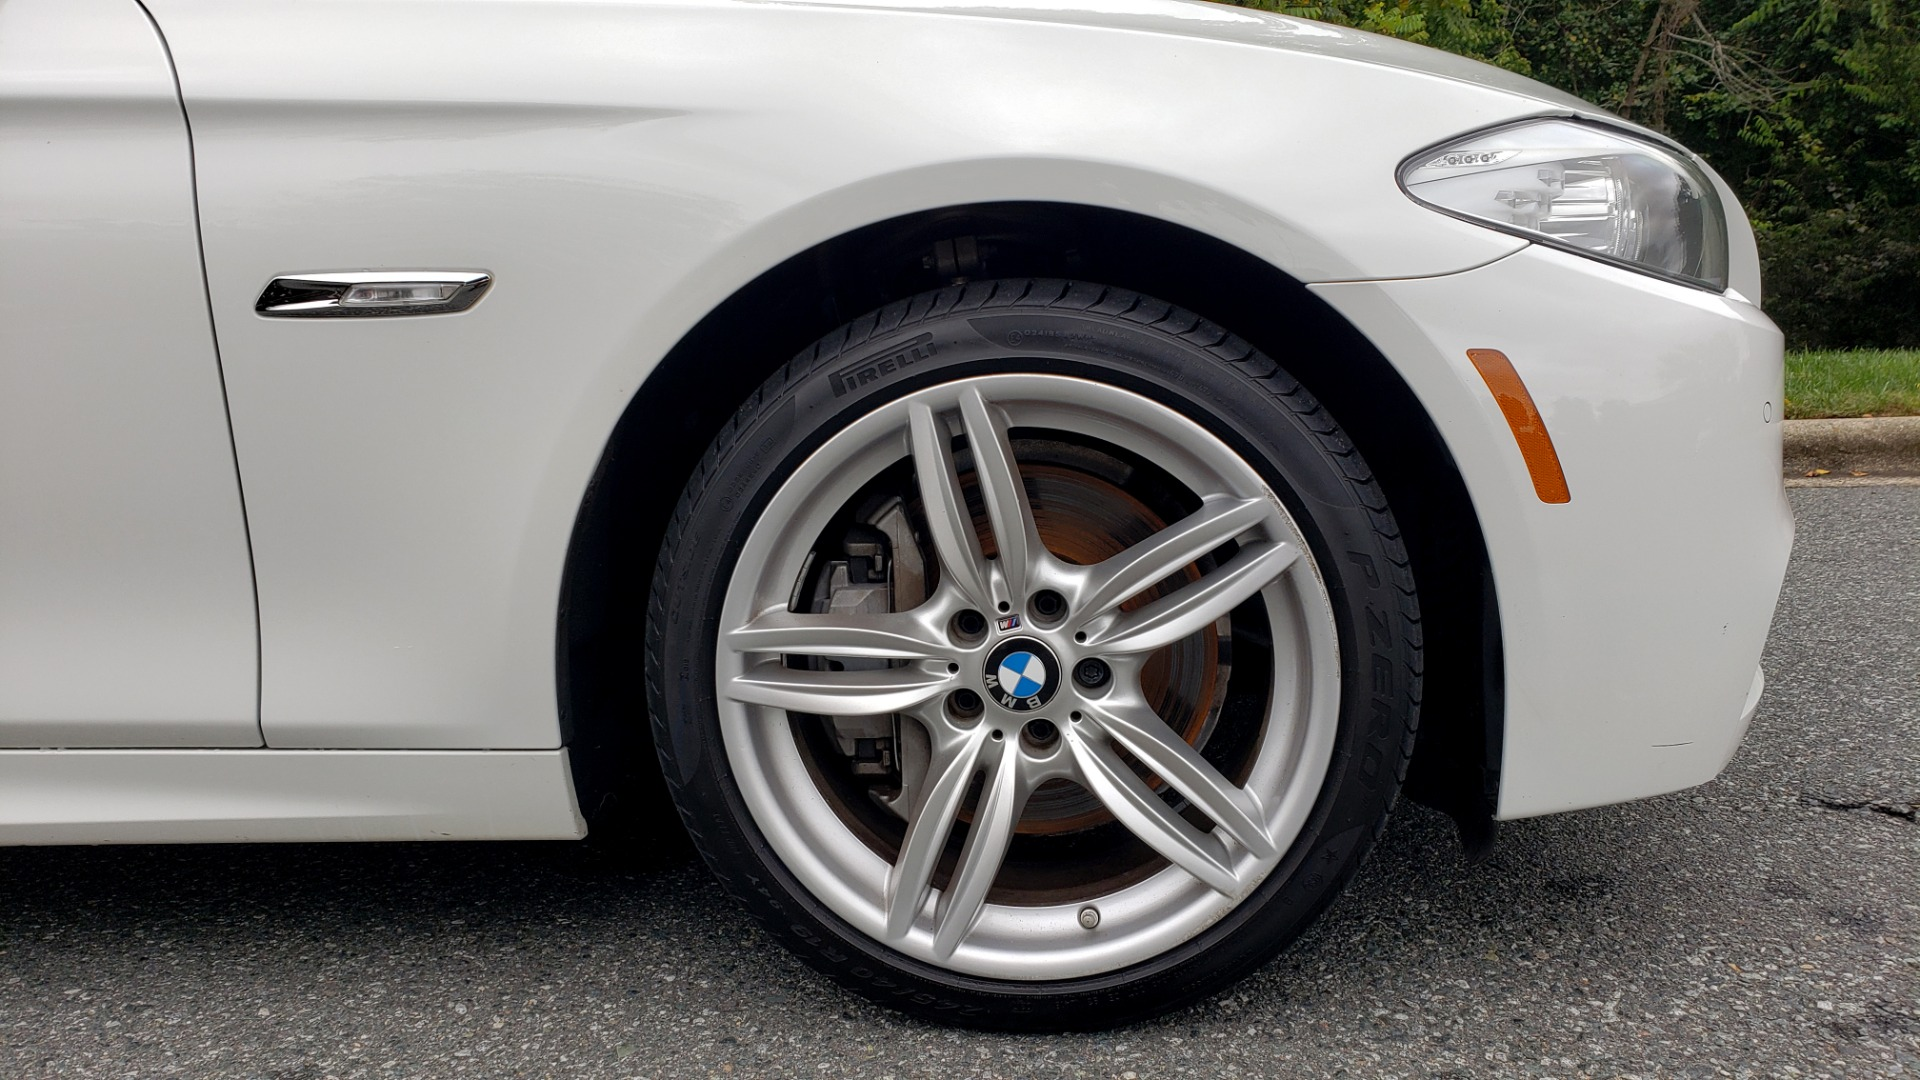 Used 2012 BMW 5 SERIES 550I M SPORT / NAV / CONV PKG / SUNROOF / PREM SND / REARVIEW for sale Sold at Formula Imports in Charlotte NC 28227 74